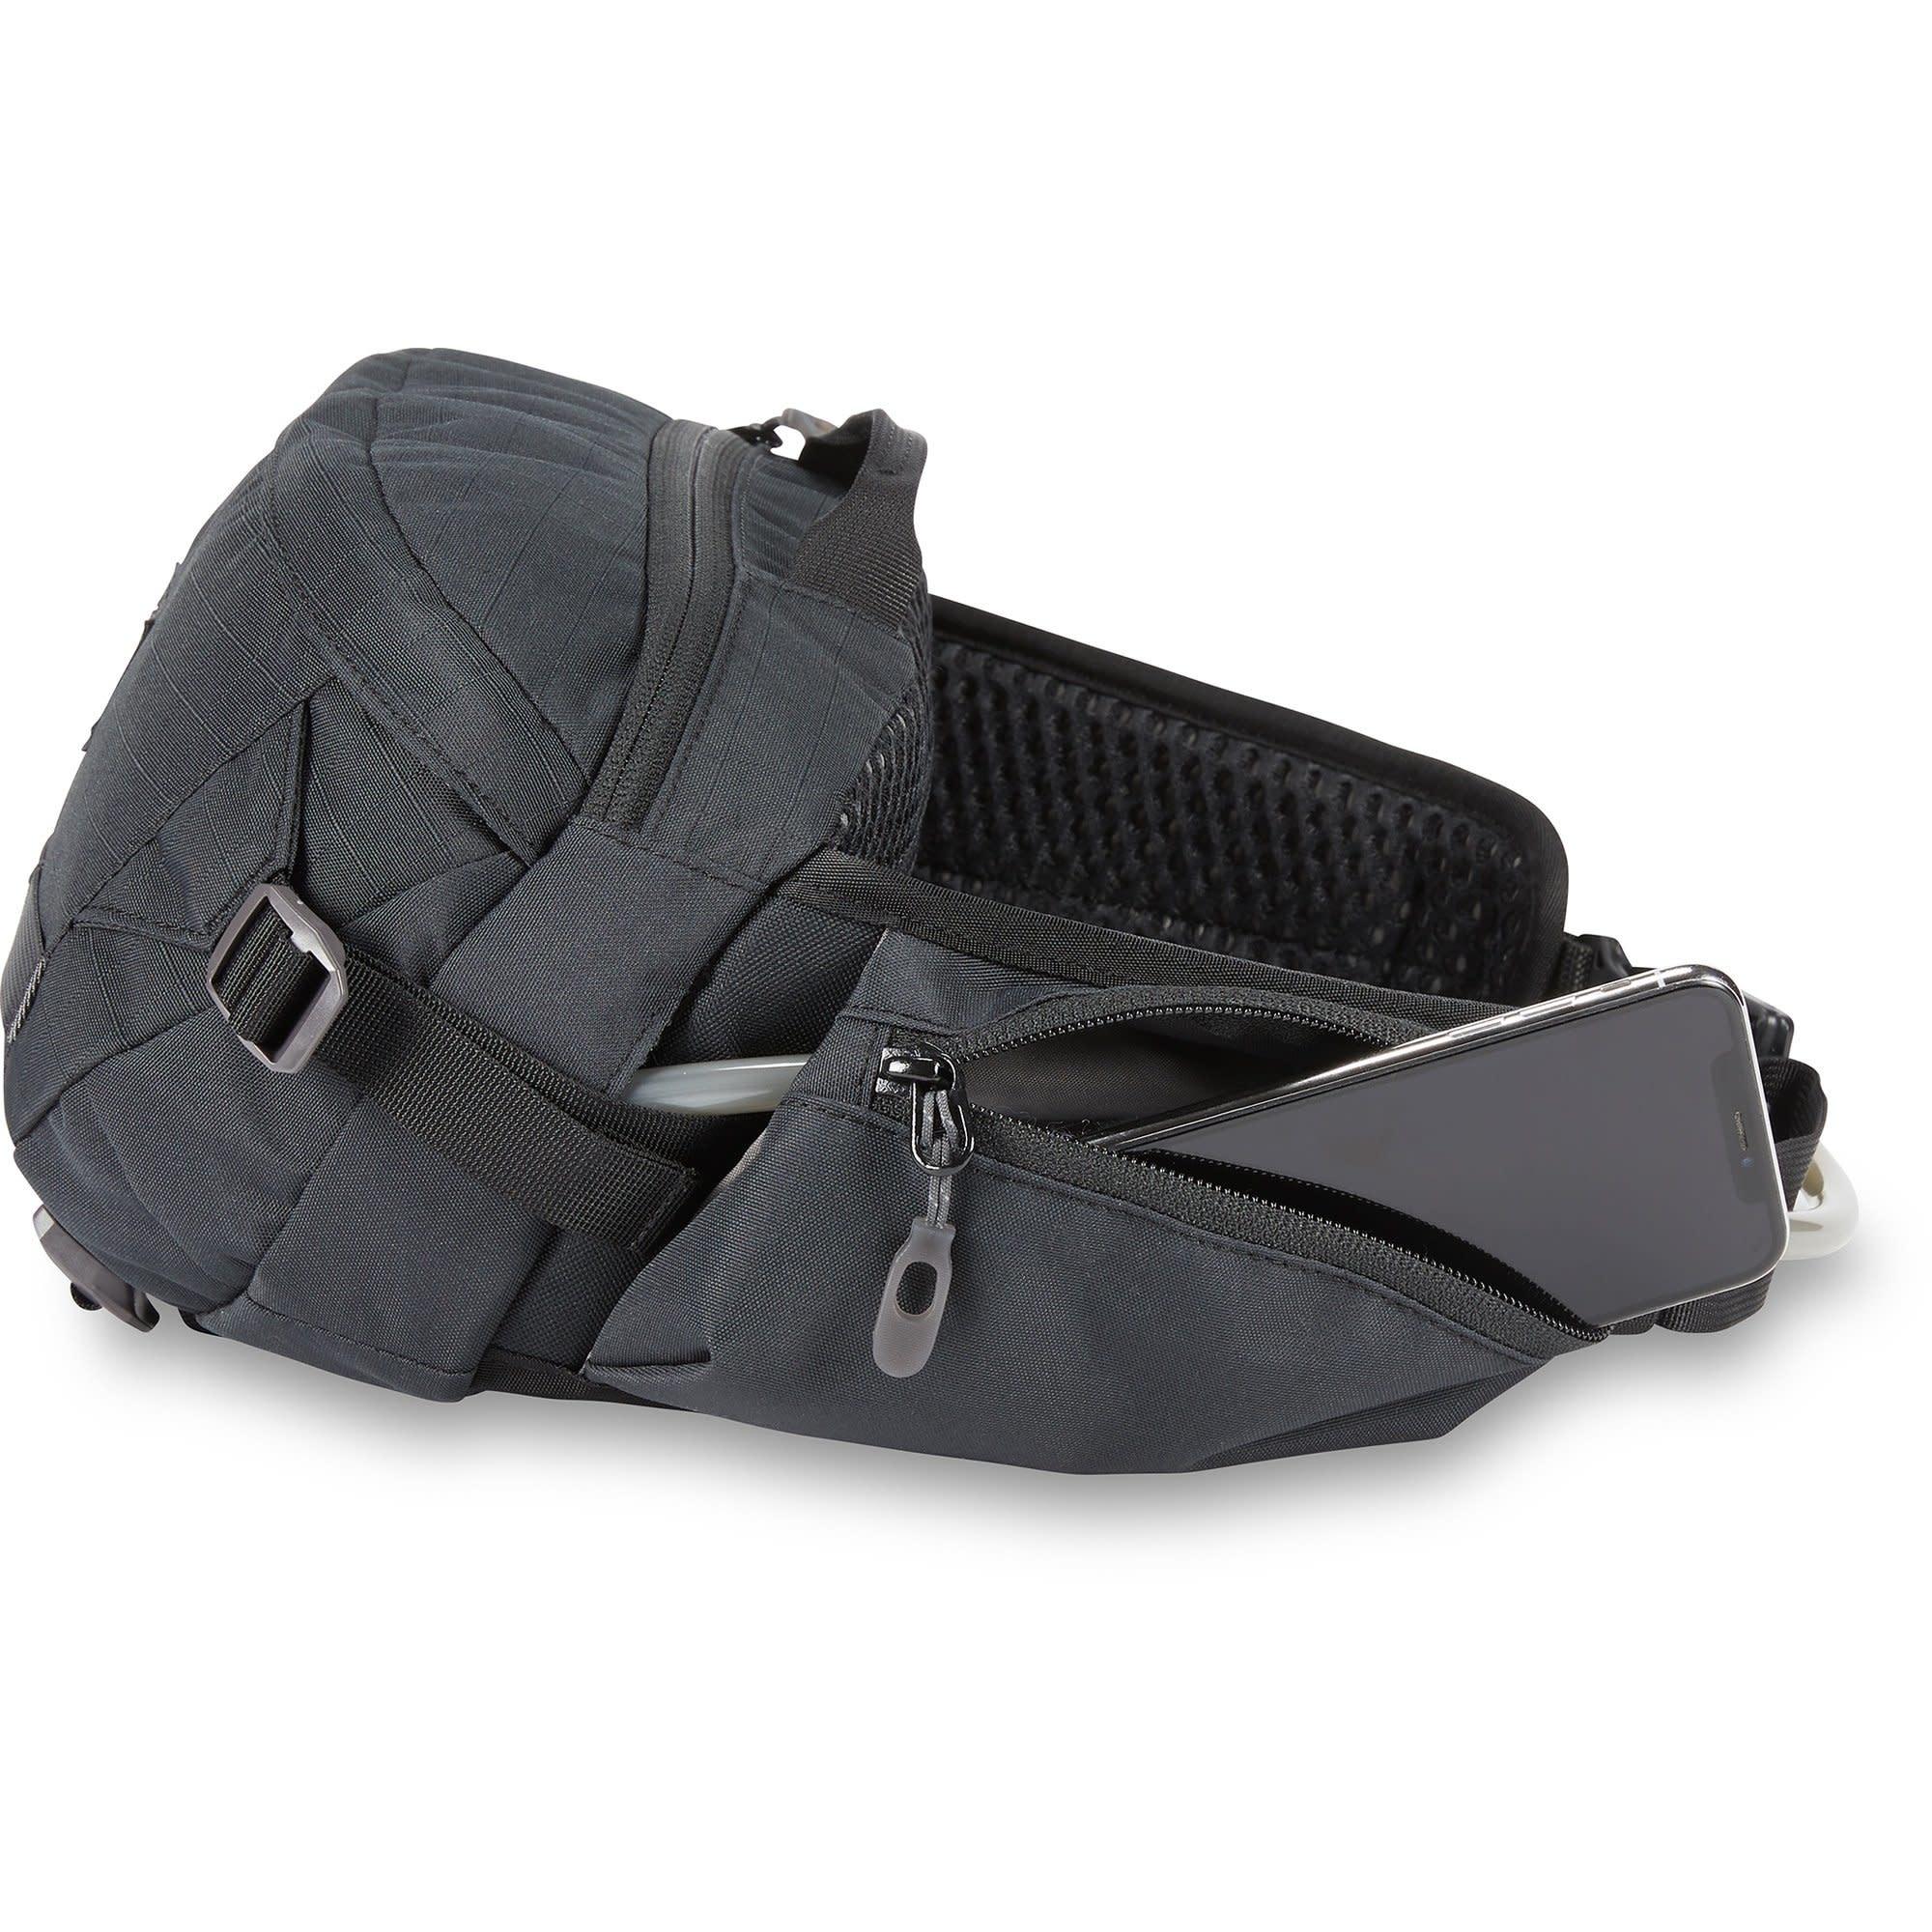 Dakine Dakine Hot Laps 5L Waist Bag